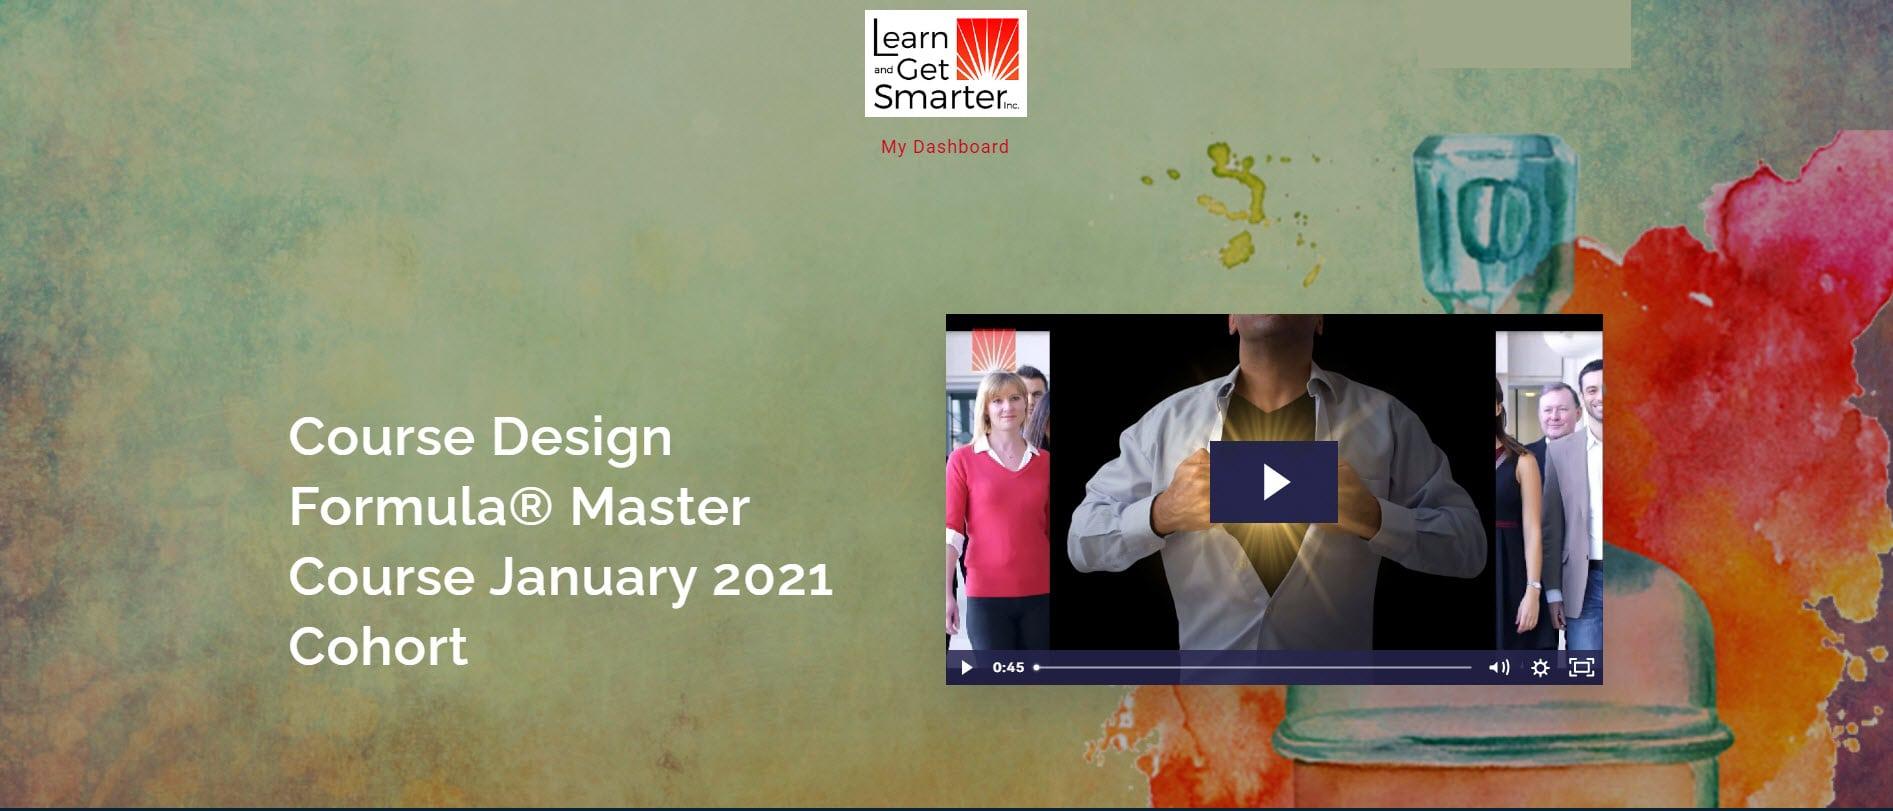 Course Design Formula® Master Course landing page screenshot